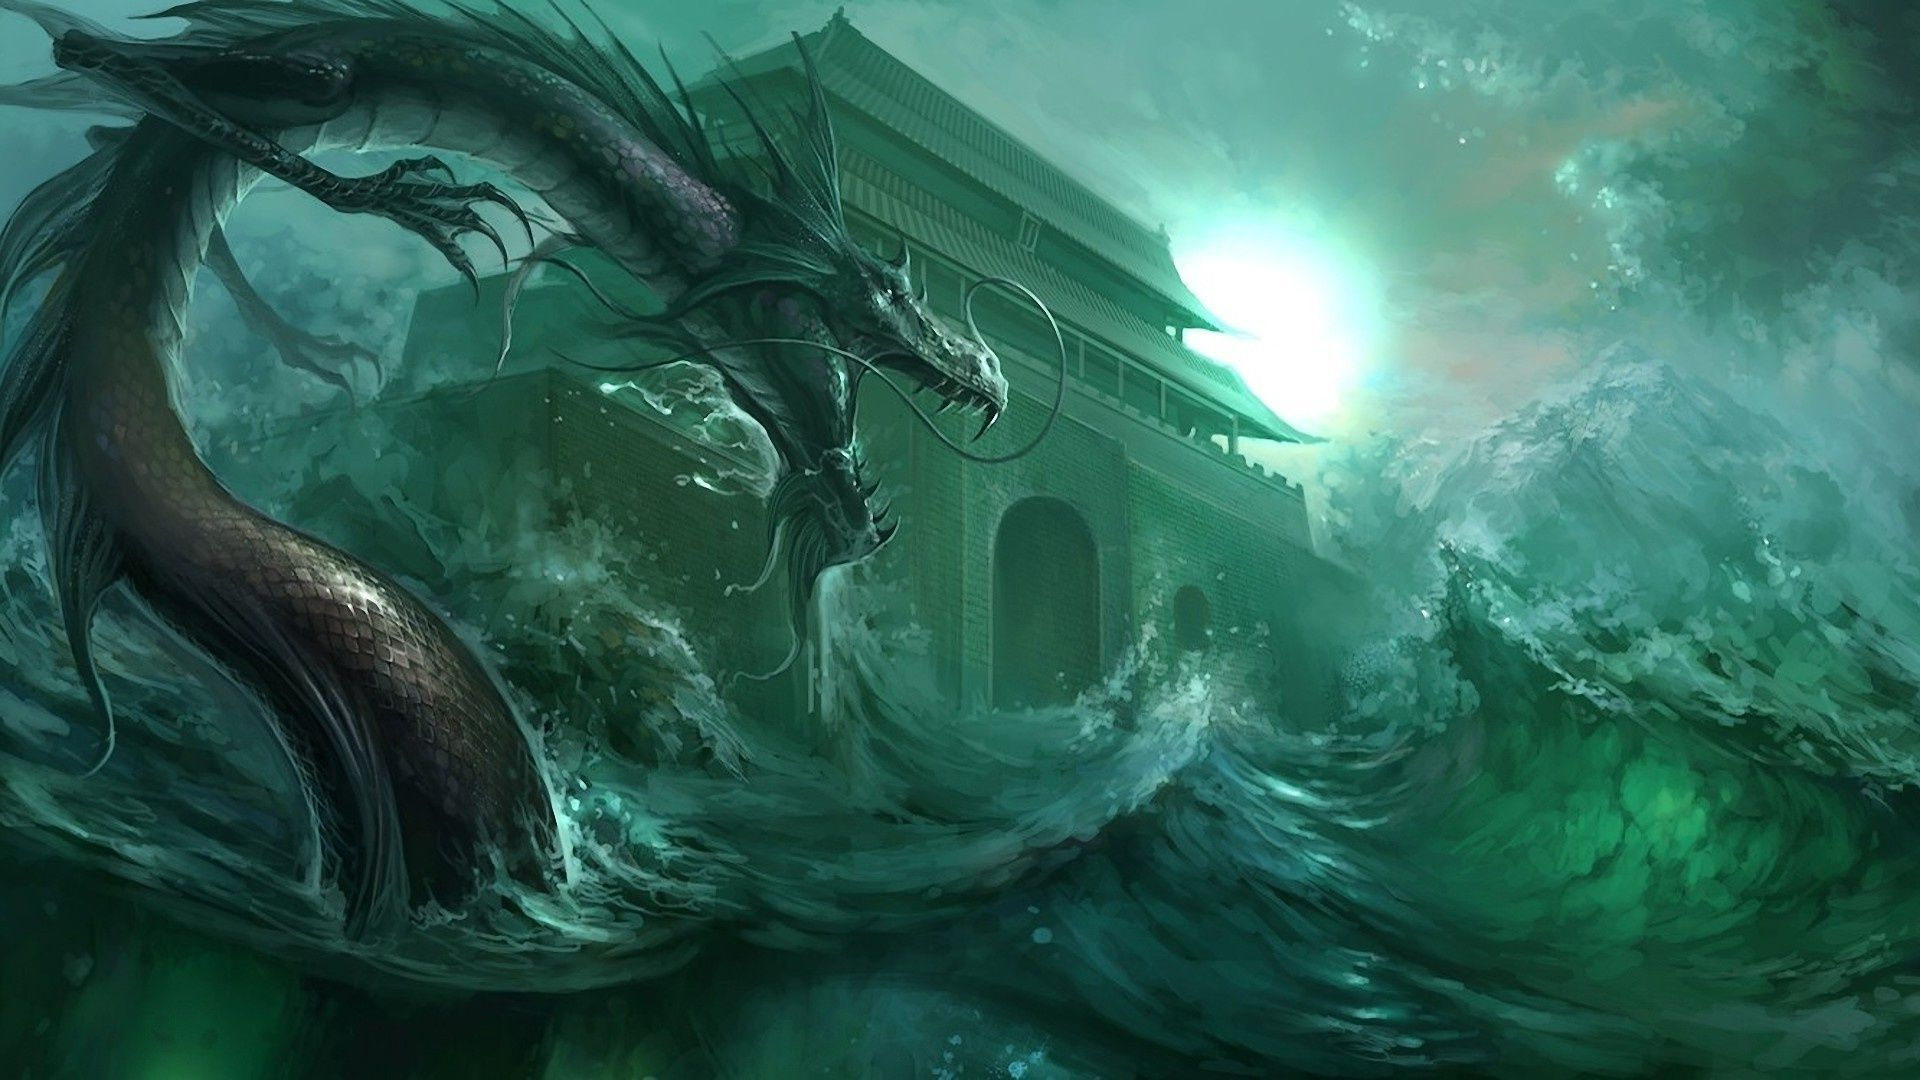 Sea Dragon Wallpaper Find Best Latest For Your PC Desktop Background